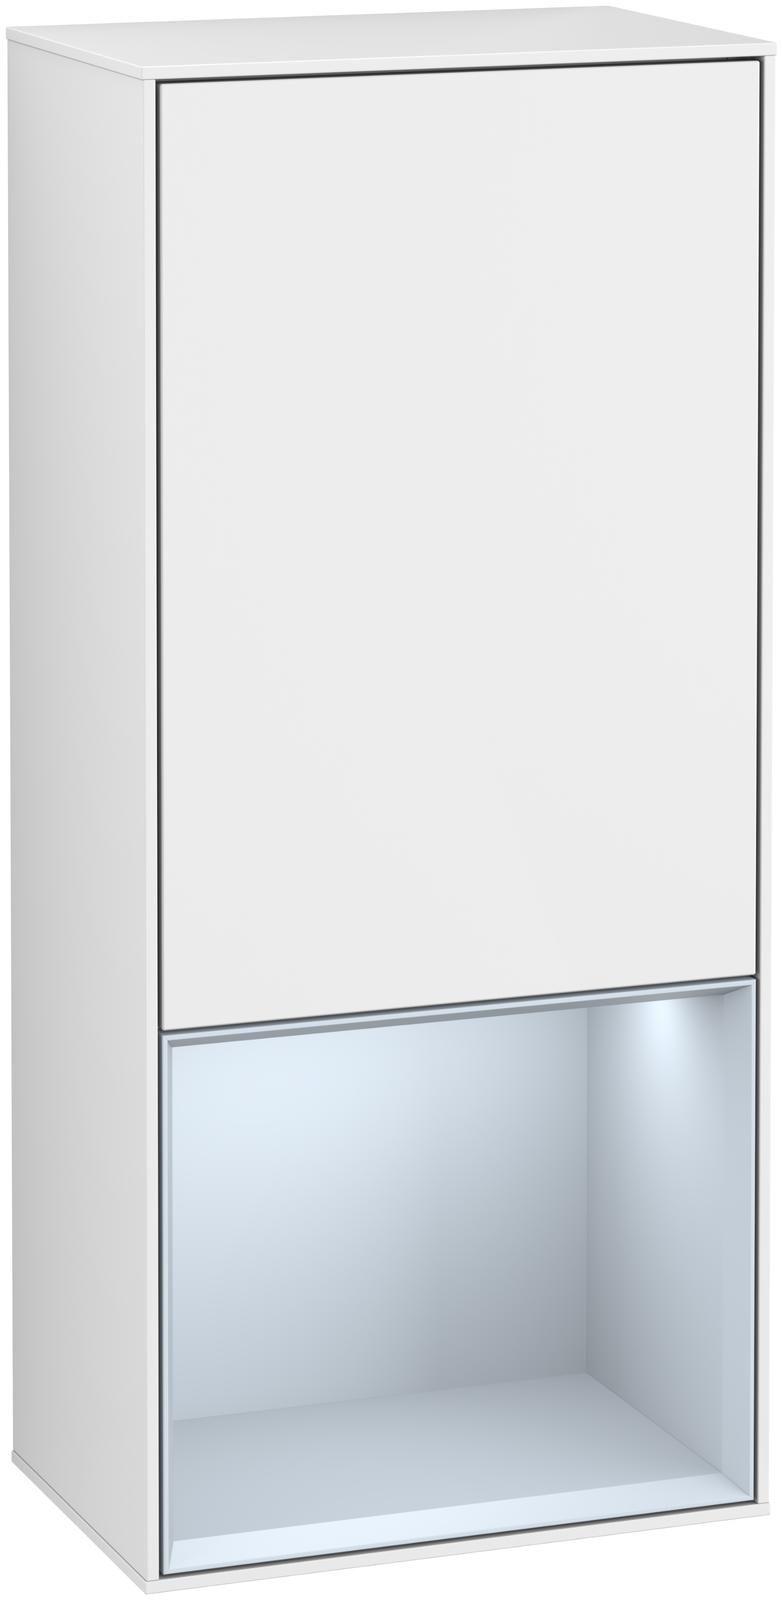 Villeroy & Boch Finion F55 Seitenschrank mit Regalelement 1 Tür Anschlag rechts LED-Beleuchtung B:41,8xH:93,6xT:27cm Front, Korpus: Glossy White Lack, Regal: Cloud F550HAGF